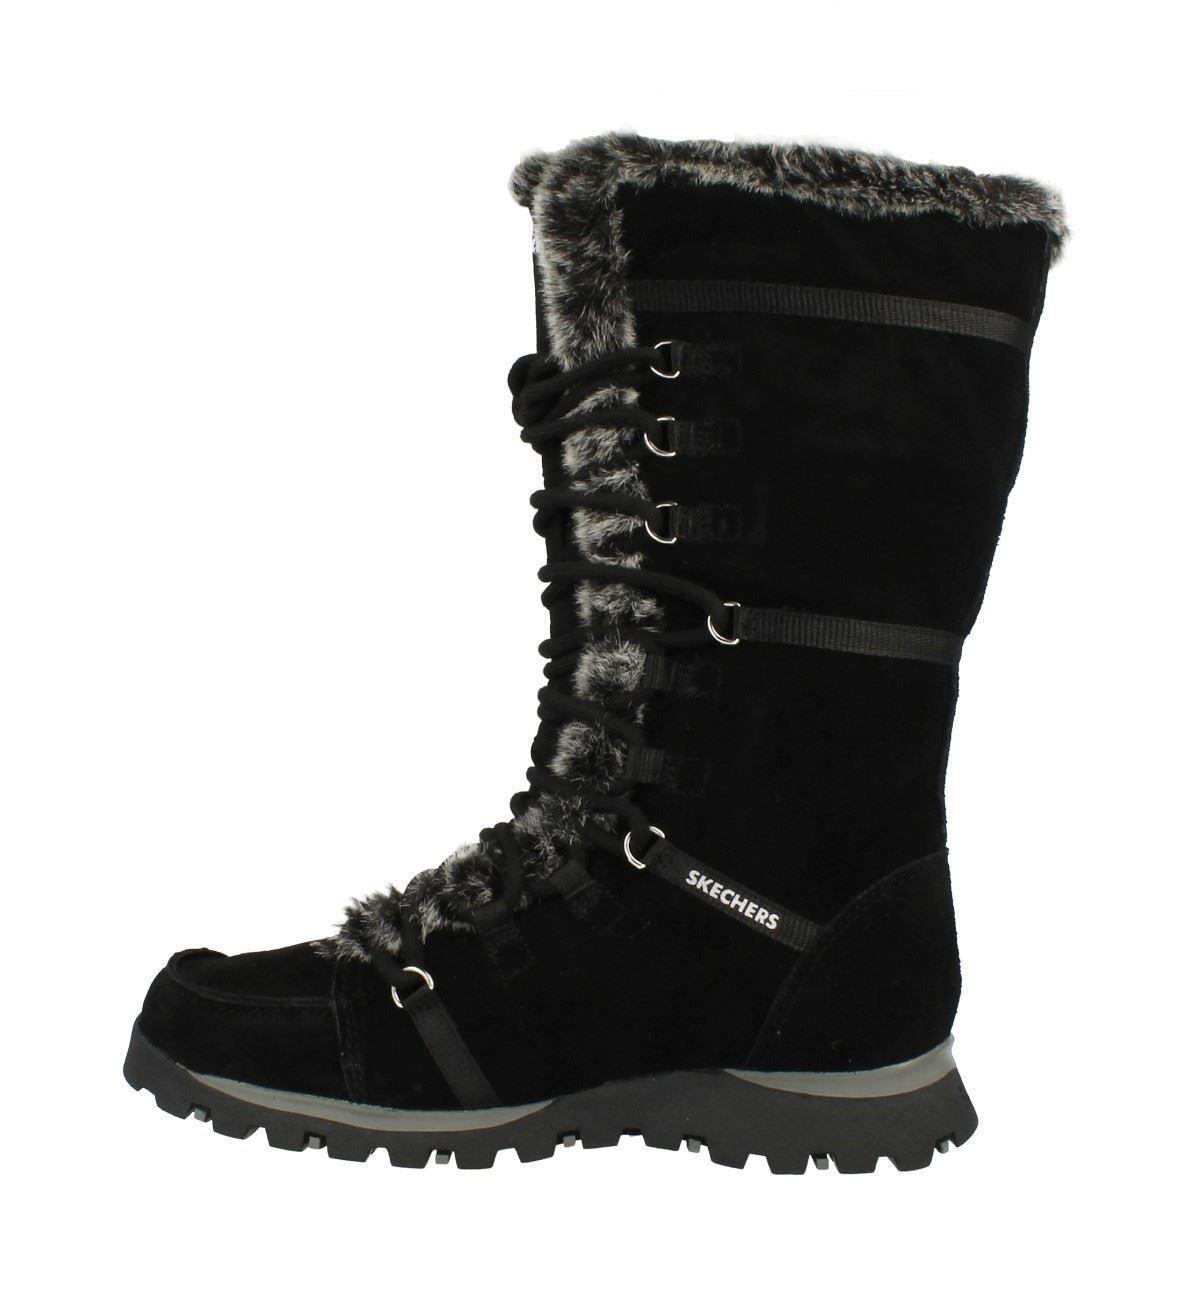 Ladies Skechers Mid Calf Winter Boots Grand Jams Unlimited